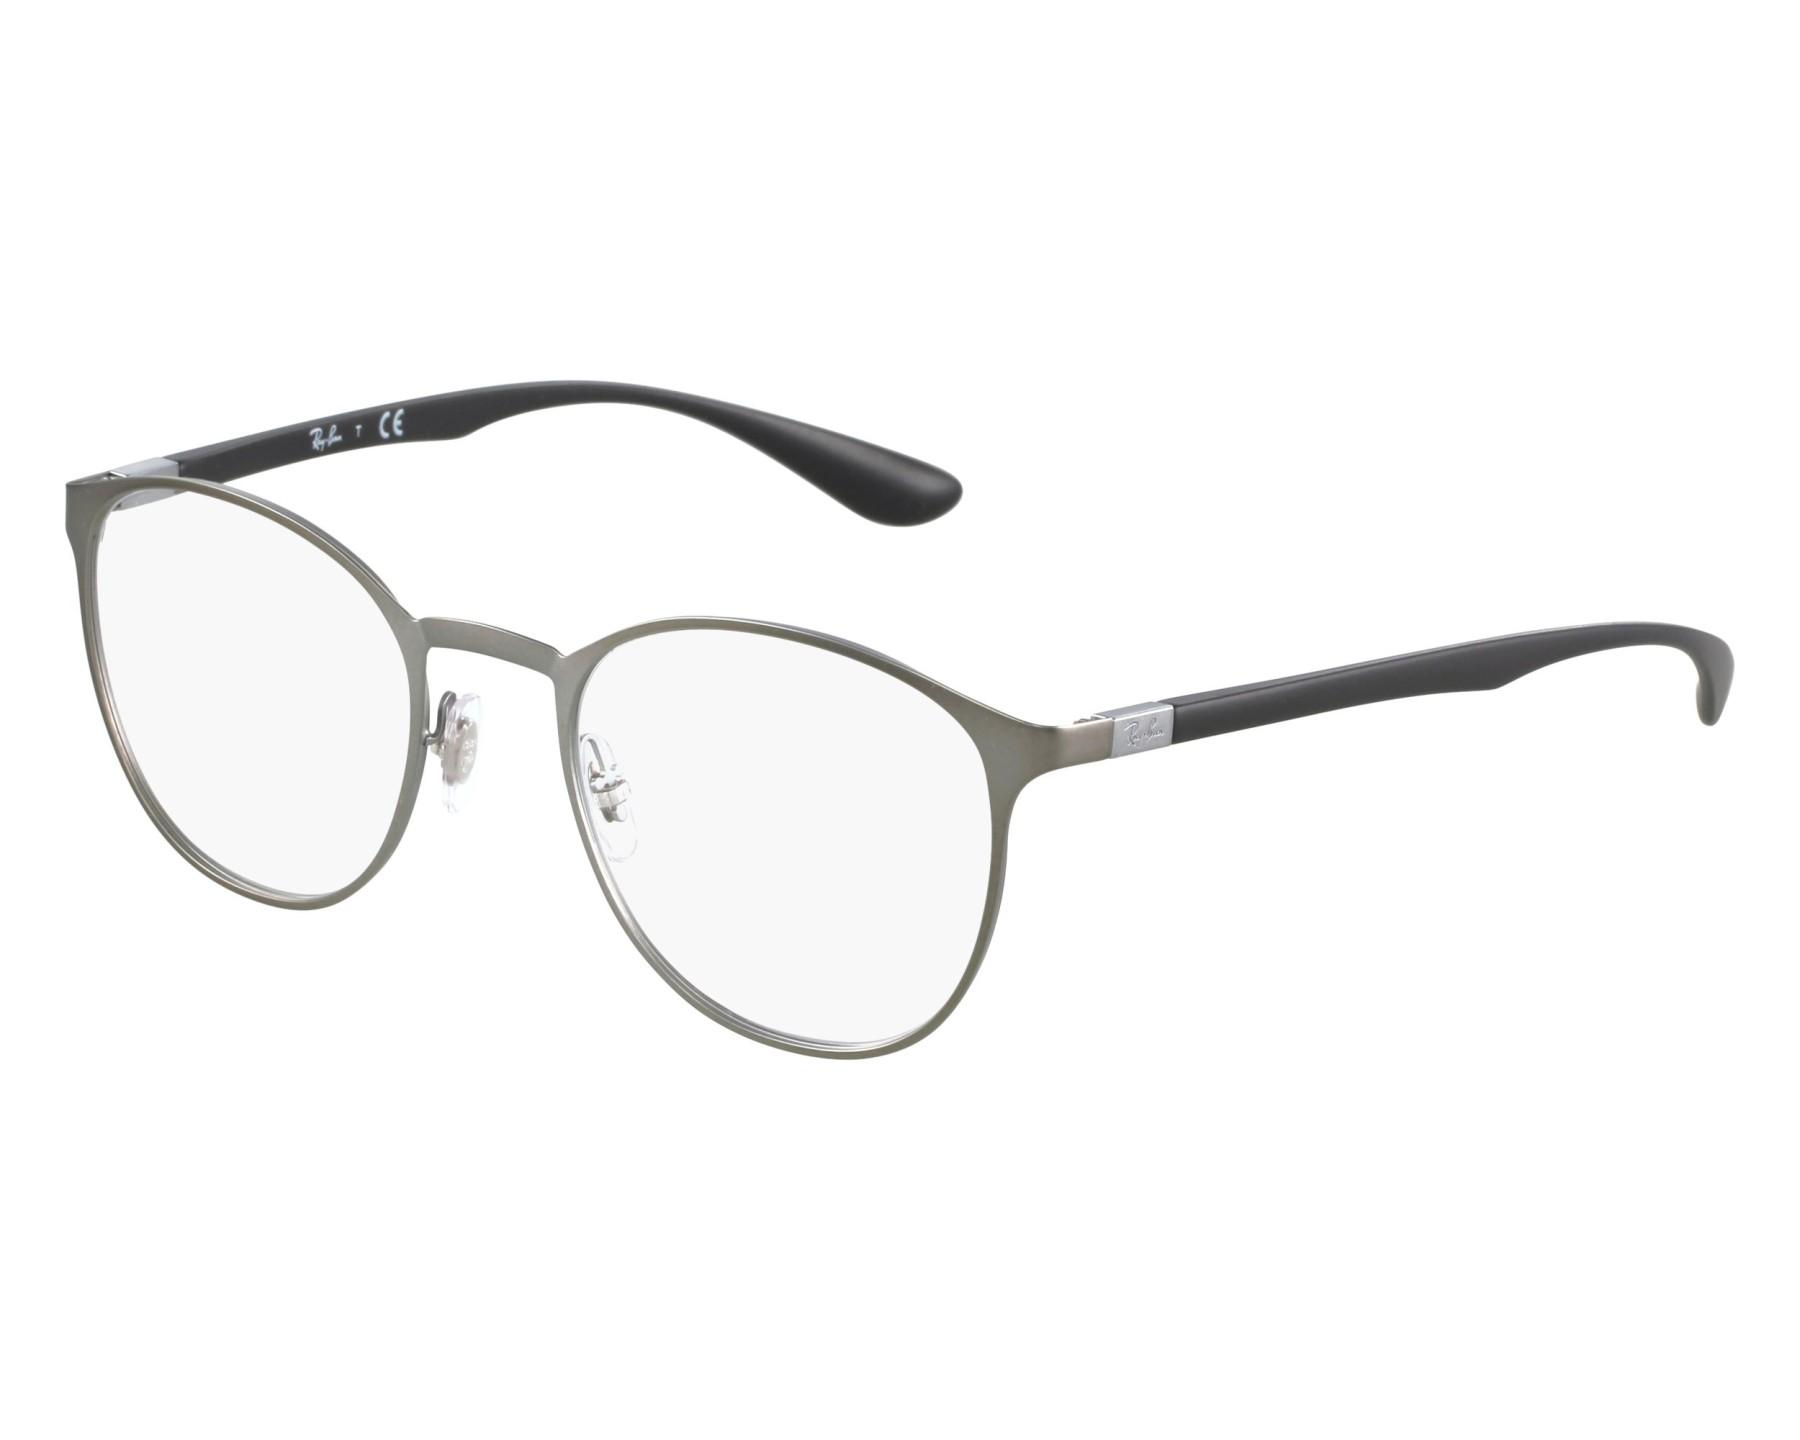 Ray Ban Eyeglasses Rx Bronze